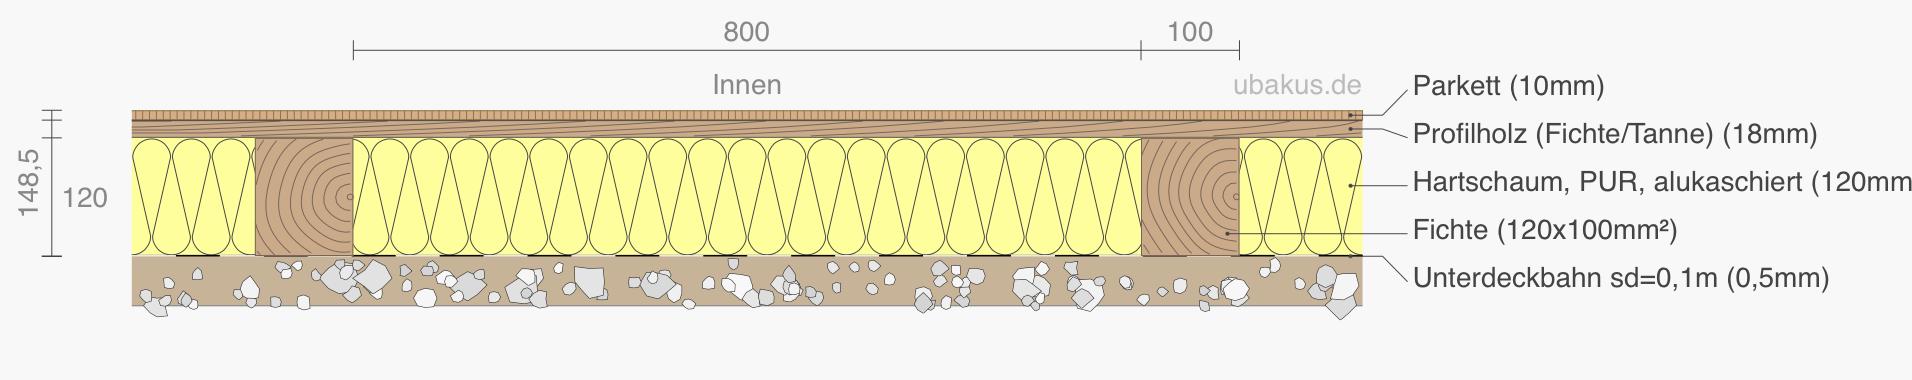 Bodenaufbau mit Dämmung, www.ubakus.de